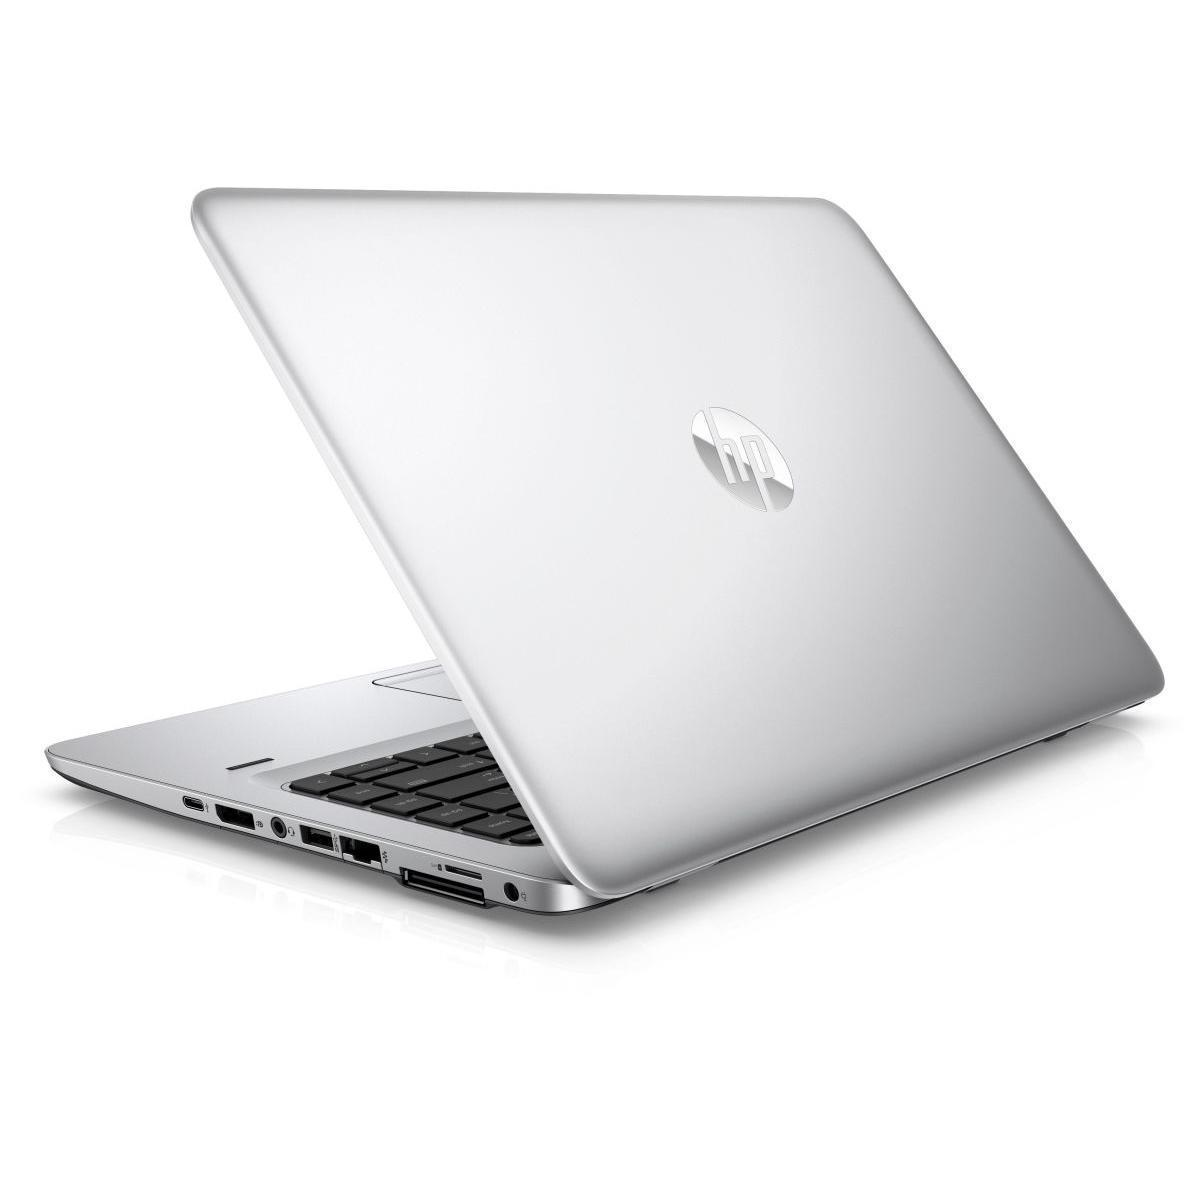 "Hp EliteBook 840 G3 14"" Core i5 2,3 GHz  - SSD 128 GB - 4GB QWERTY - Englisch (US)"